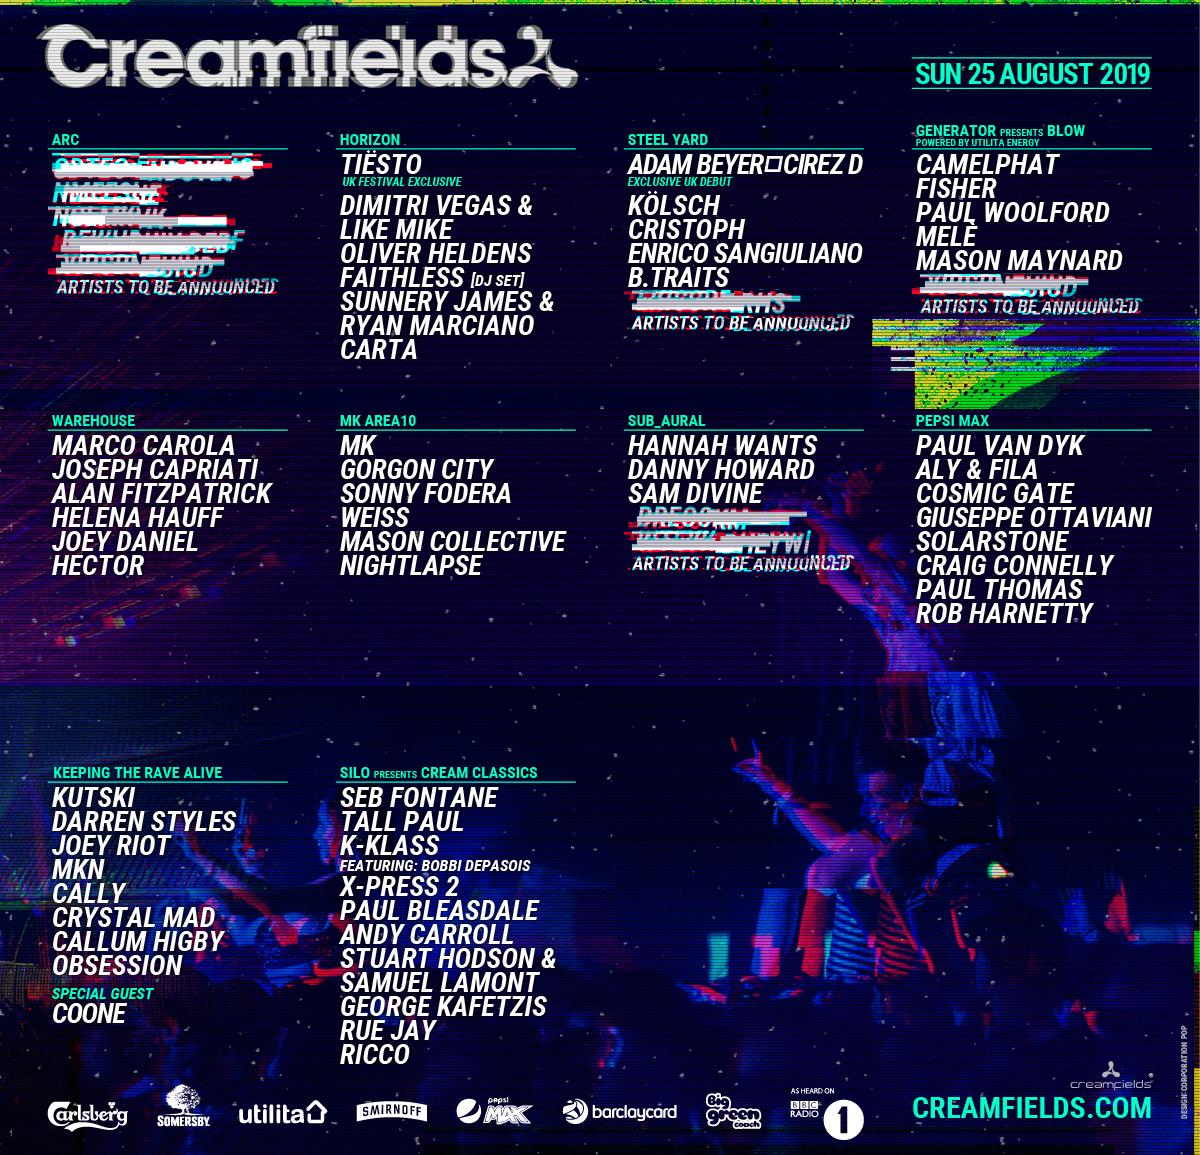 Creamfields 2019 Lineup - Sunday